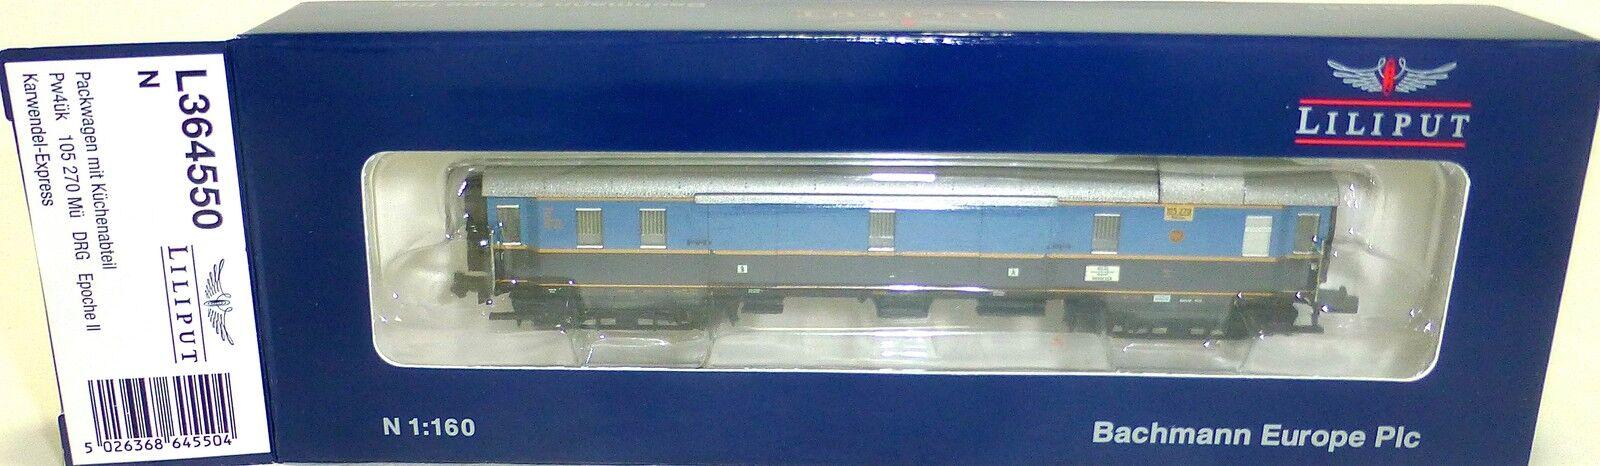 Karwendel Express Vagone per Borsaagli Pw4ük DRG Epii Liliput L364550 N 1:160